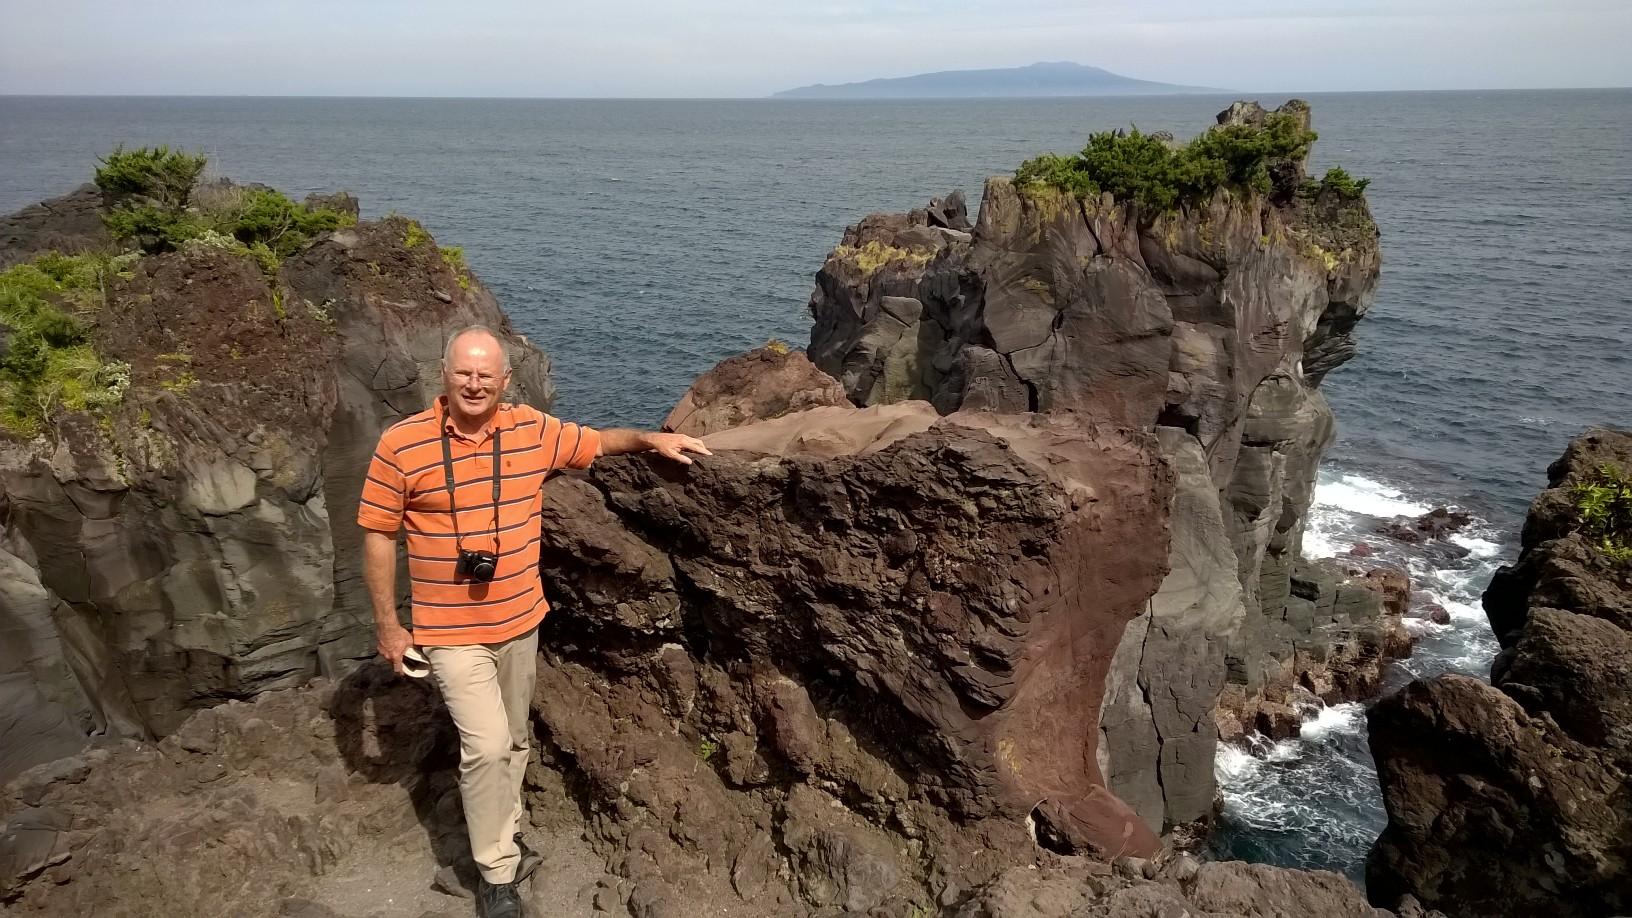 On the cliffs of the Jogasaki coast